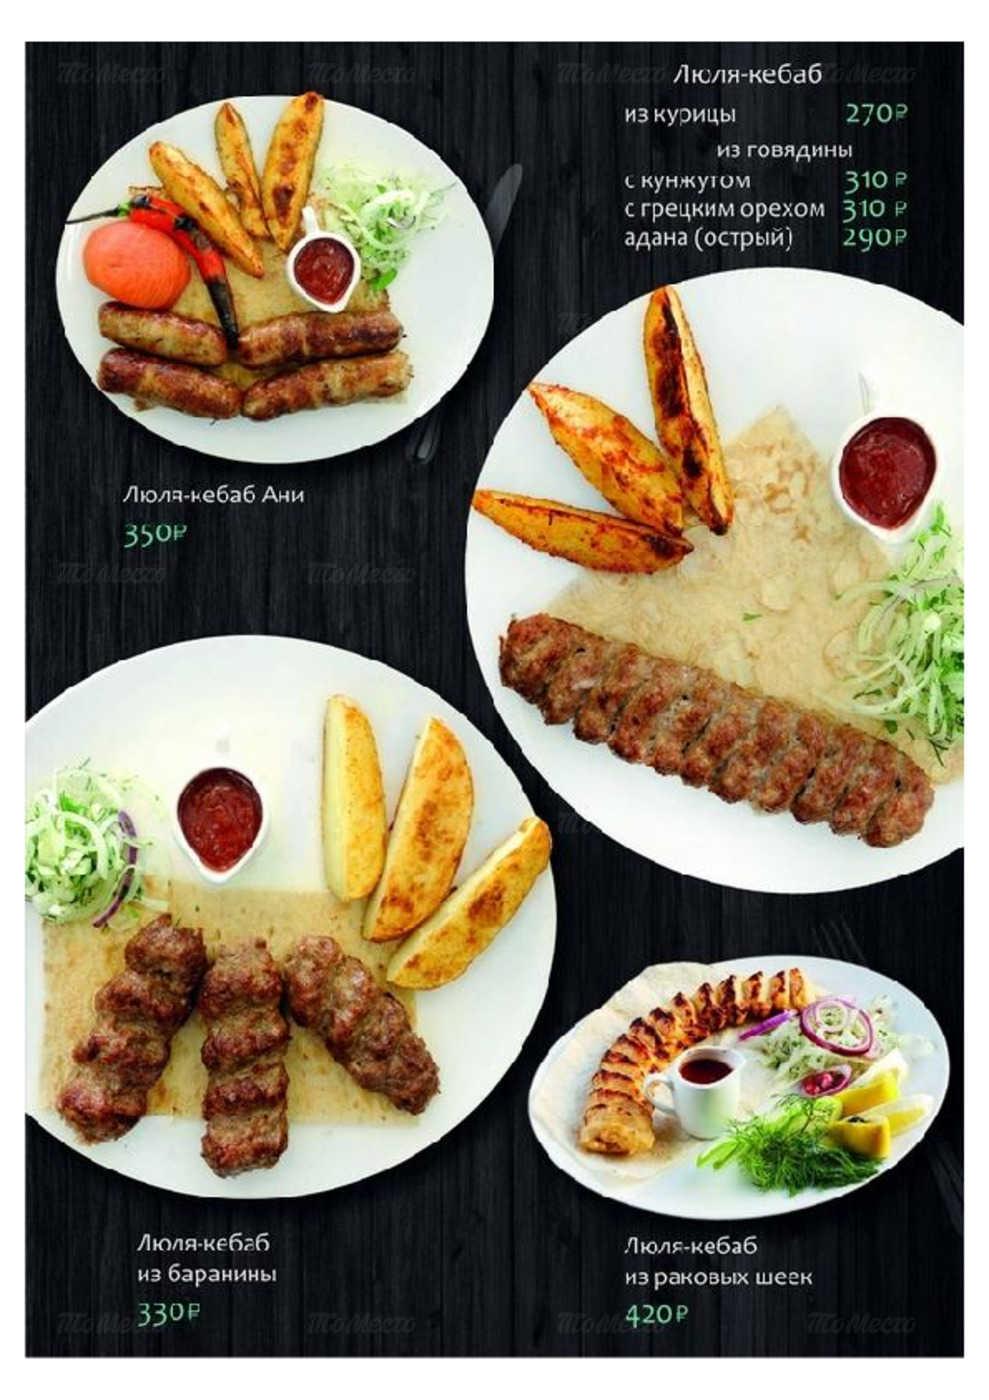 Меню ресторана Любимый Хабиб на проспекте Стачек фото 28